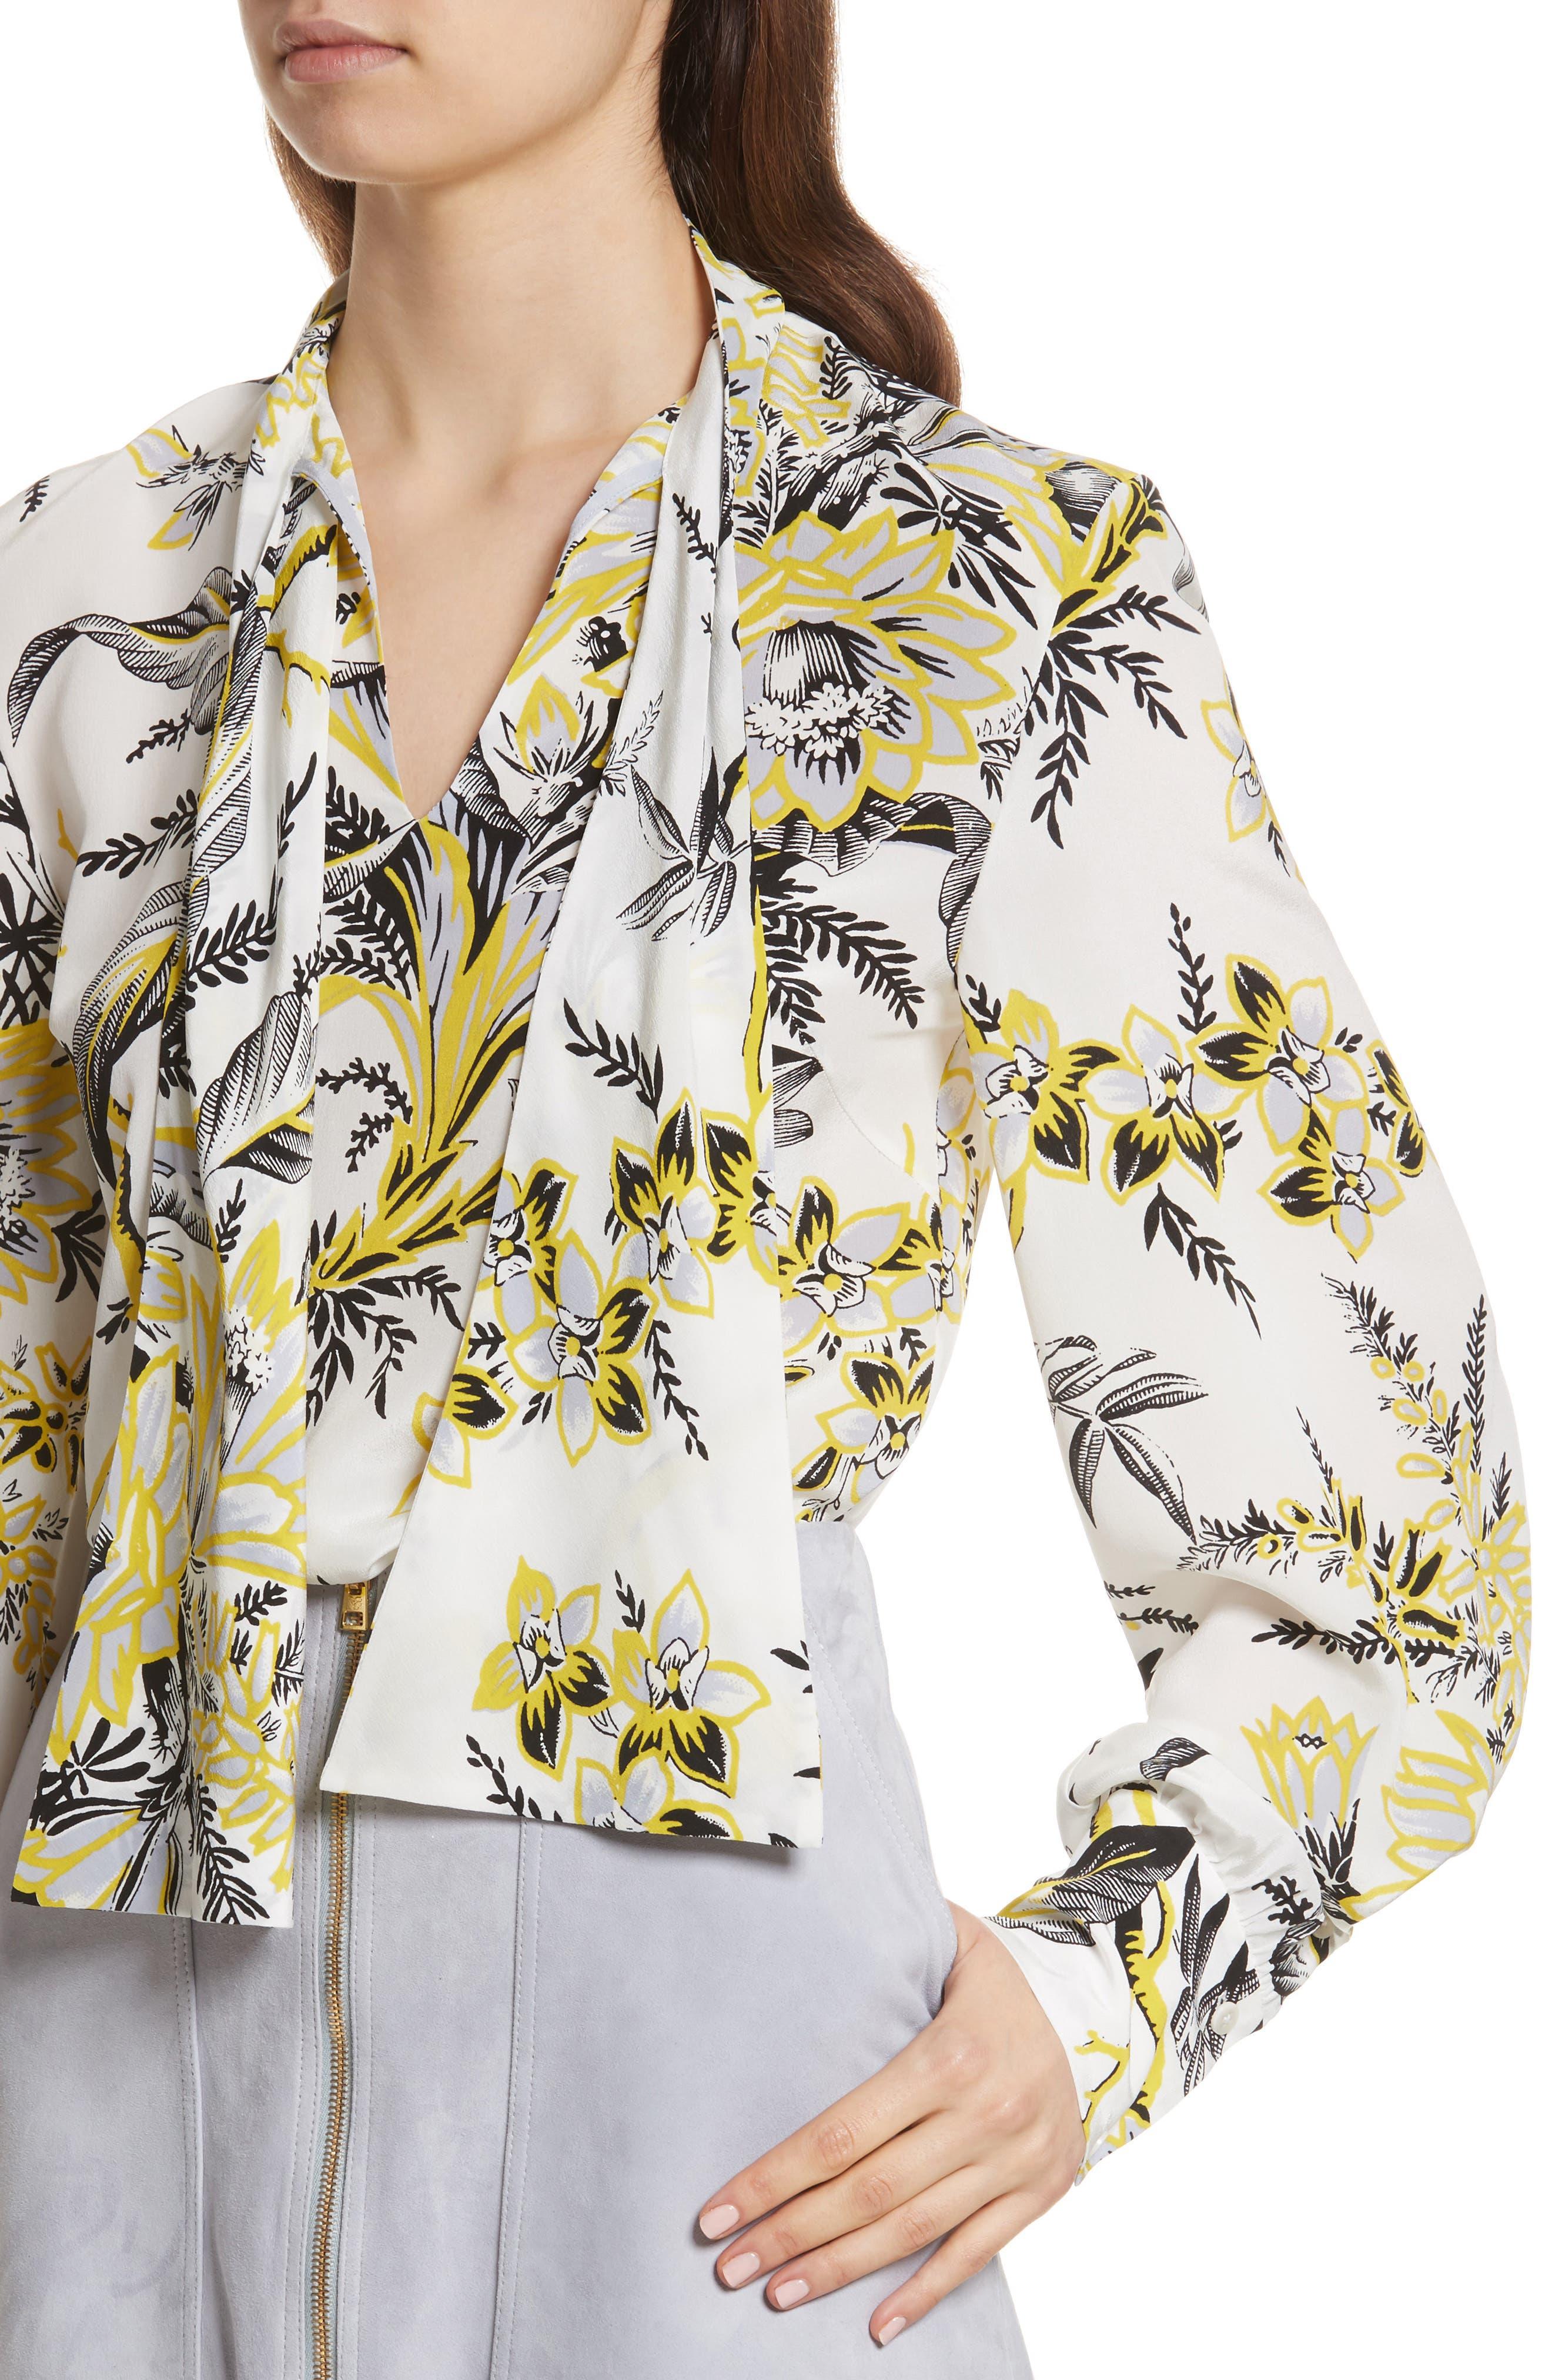 Diane von Furstenberg Tie Neck Silk Blouse,                             Alternate thumbnail 4, color,                             Avalon Ivory